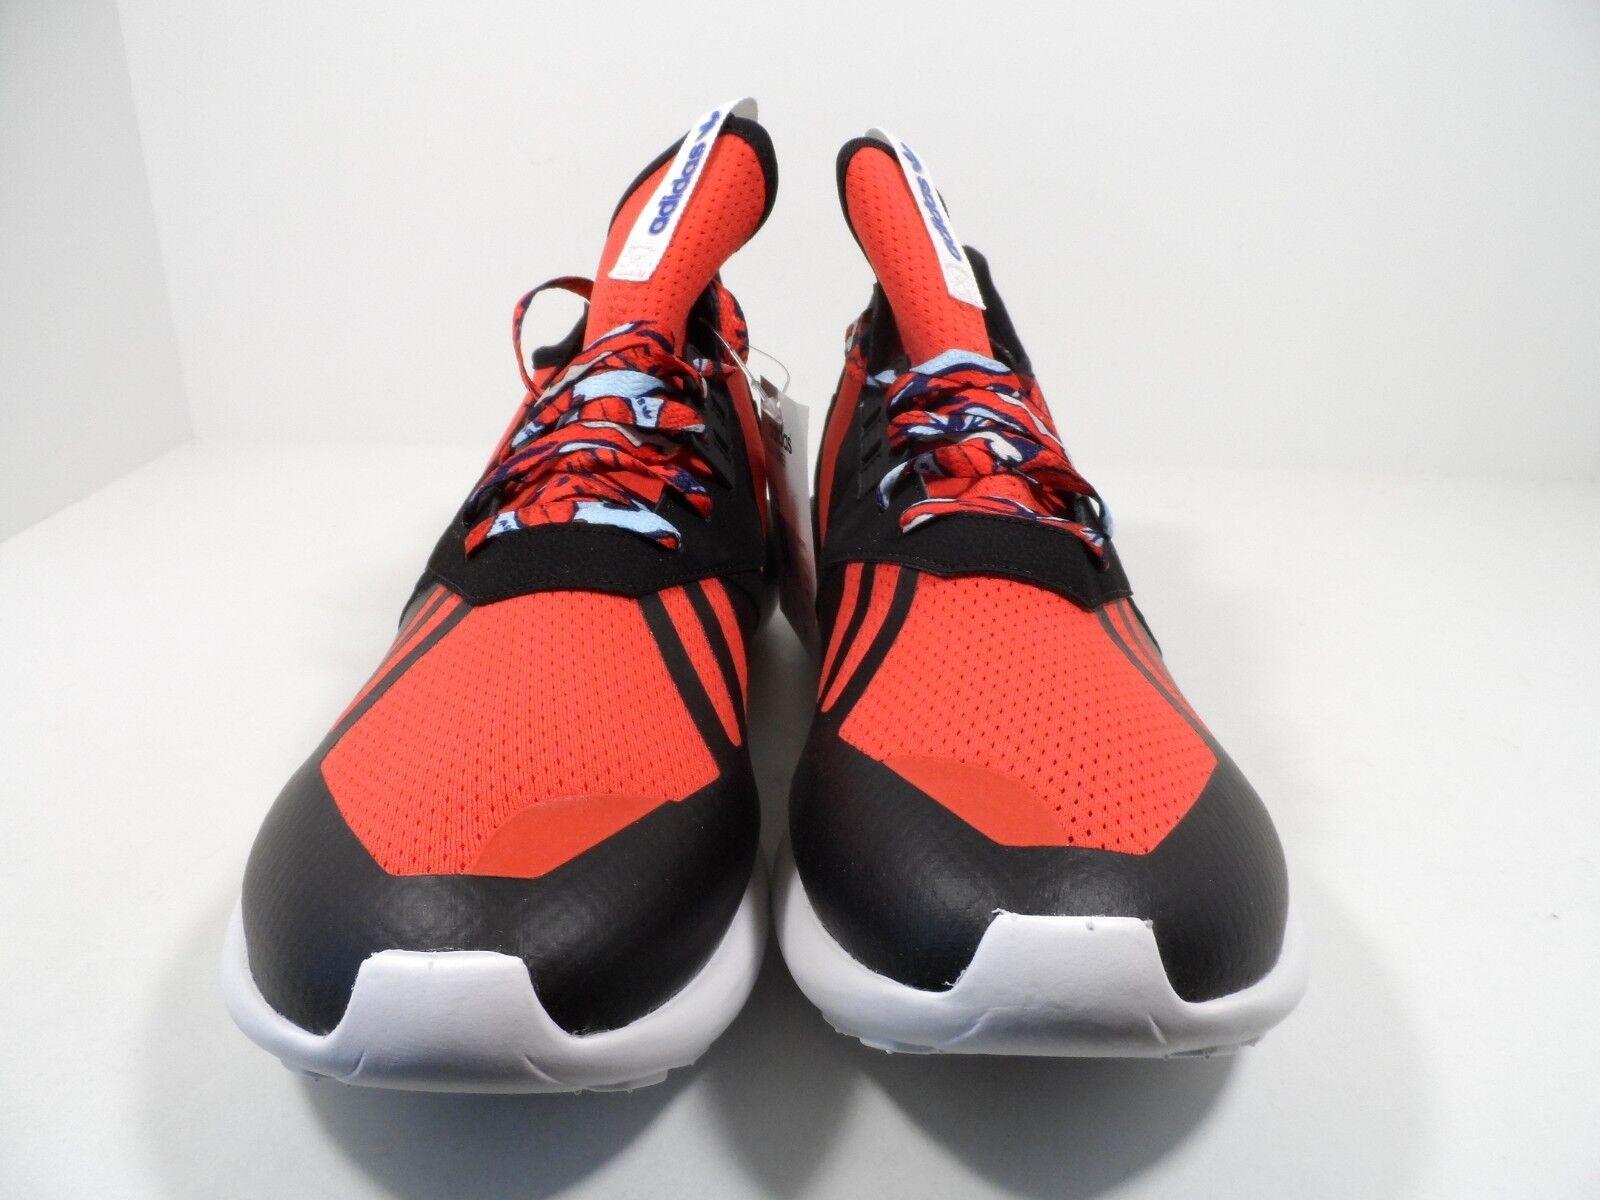 Adidas Originals da Uomo Uomo Uomo Corridore Tubolare Rosso Nero Bianco | Sale Italia  22d5de